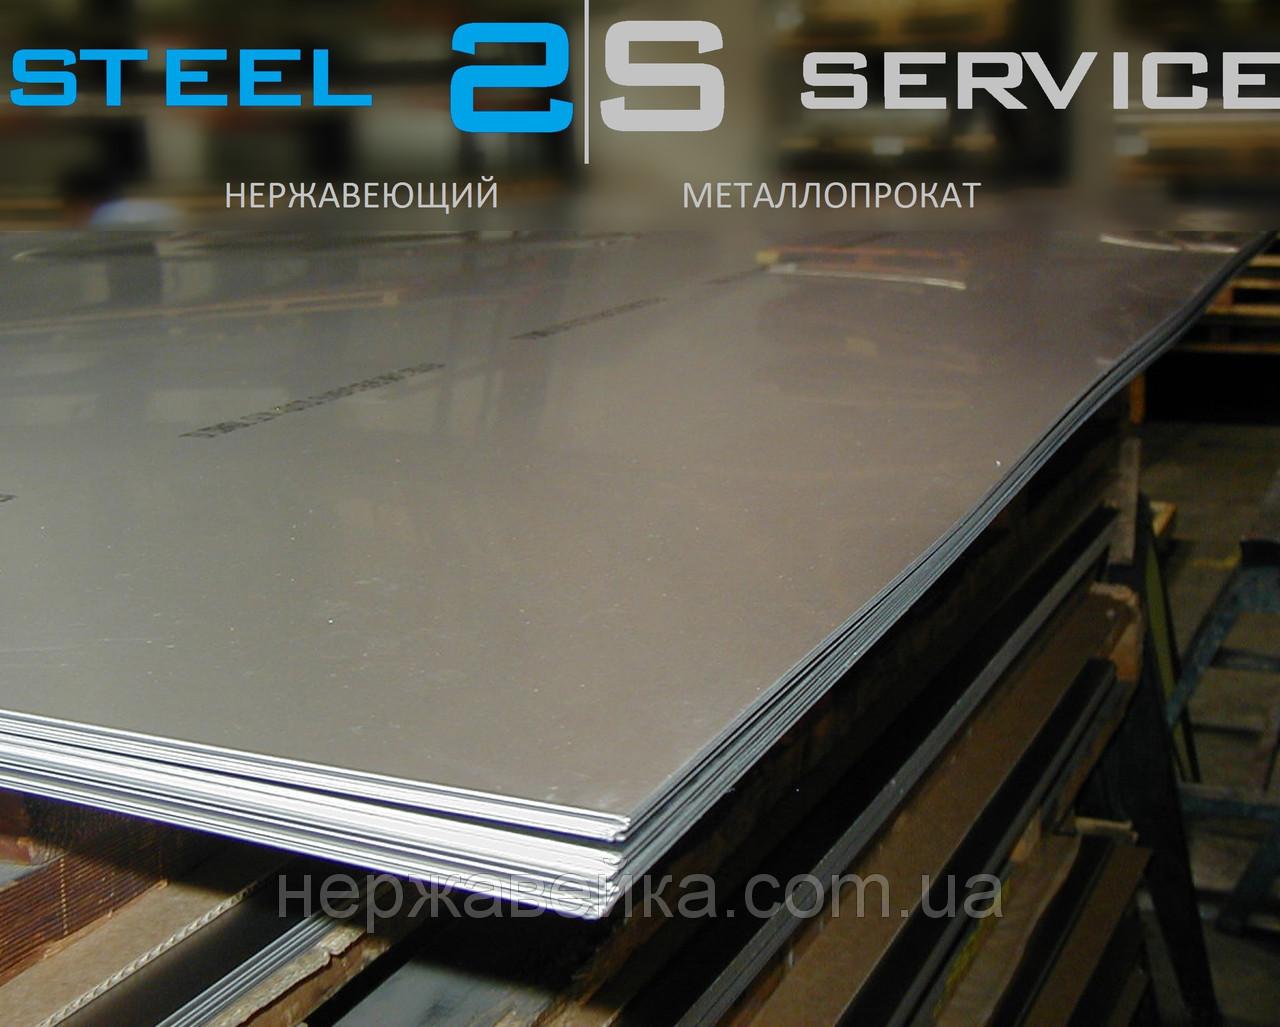 Нержавейка лист 14х1250х2500мм  AISI 316L(03Х17Н14М3) F1 - горячекатанный,  кислотостойкий